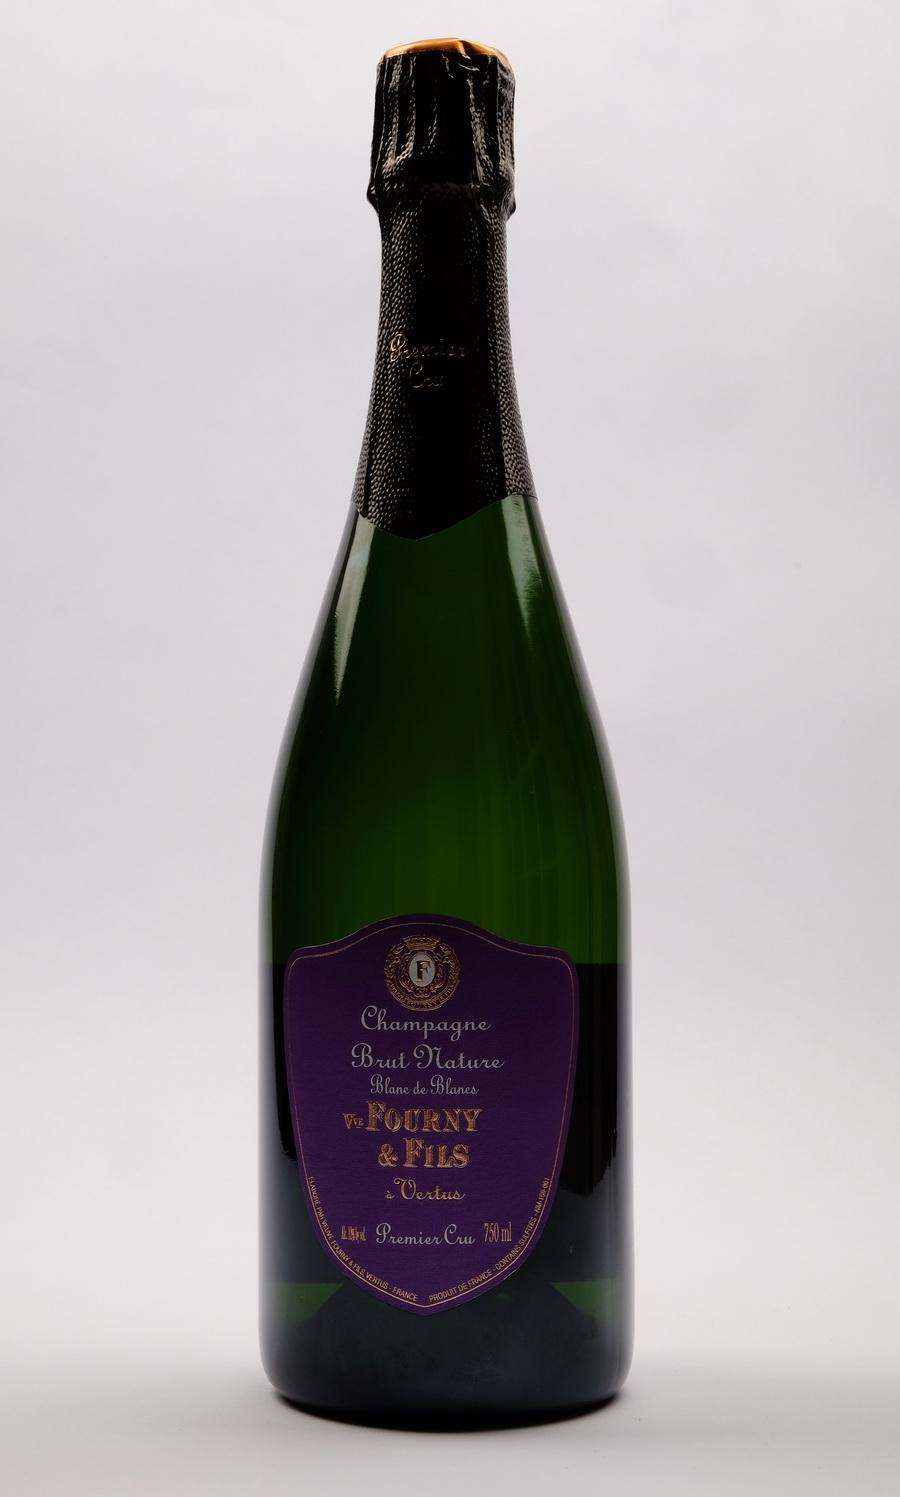 Veuve Fourny - Champagne Blanc de Blancs 1er Cru Brut Nature